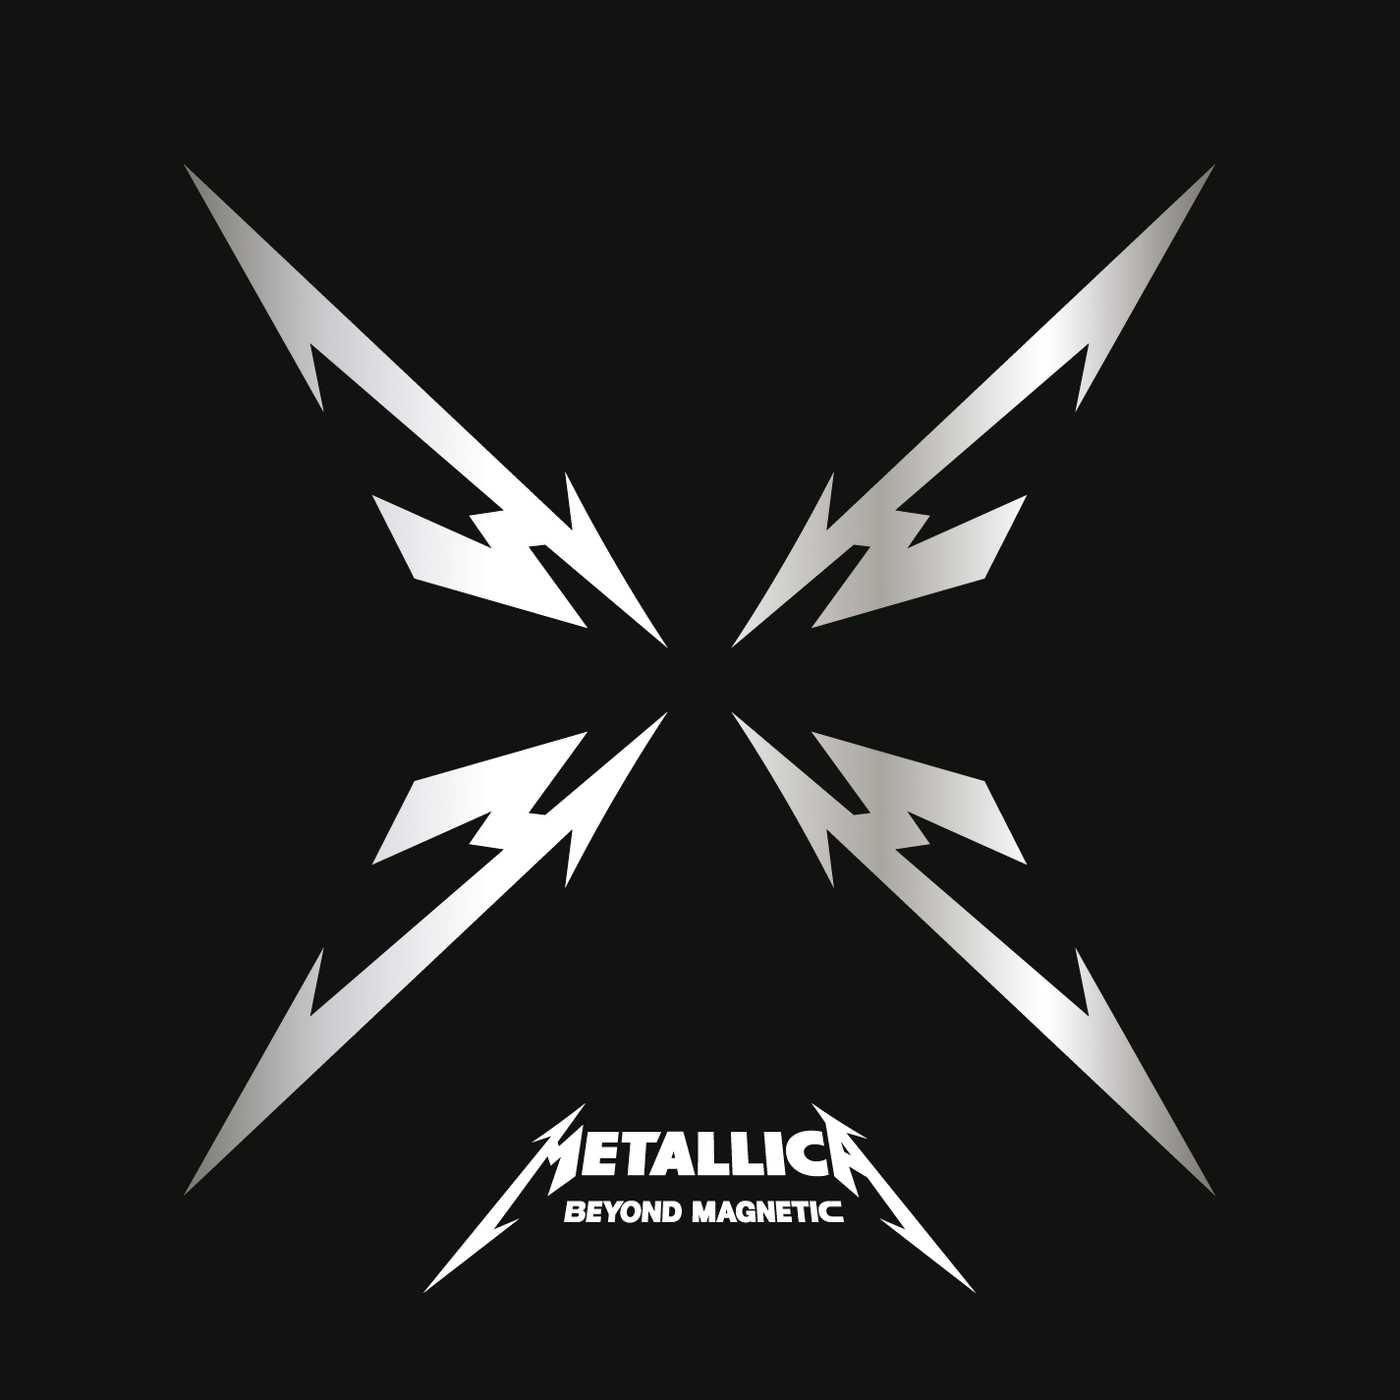 Metallica Beyond Magnetic